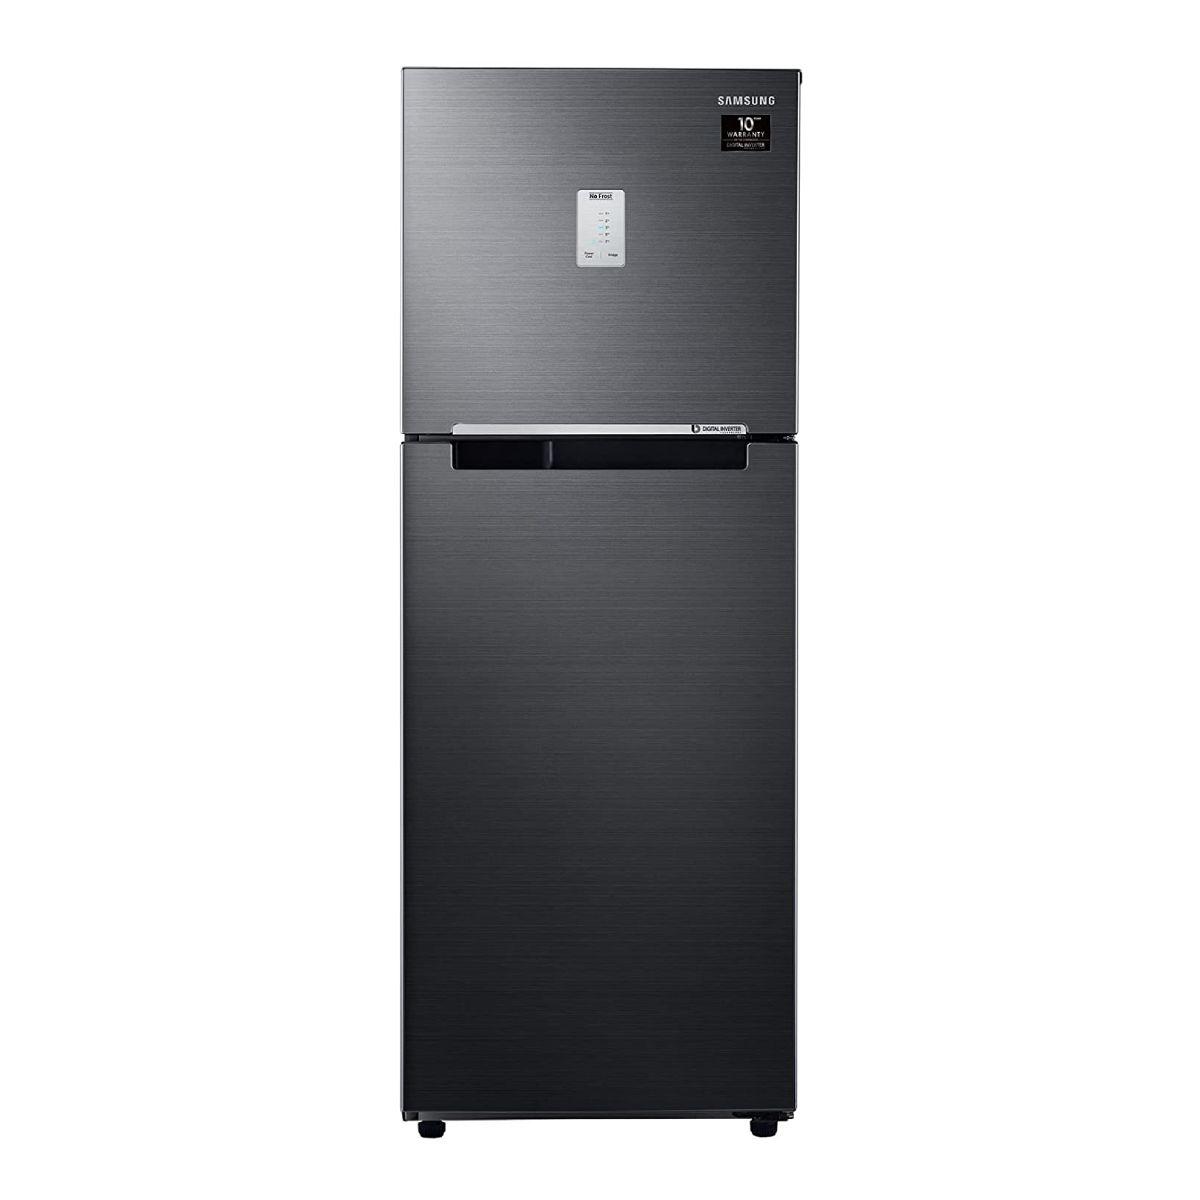 Samsung 253 L 3 Star Digital Inverter Frost Free Double Door Refrigerator (RT28A3453BX/HL)